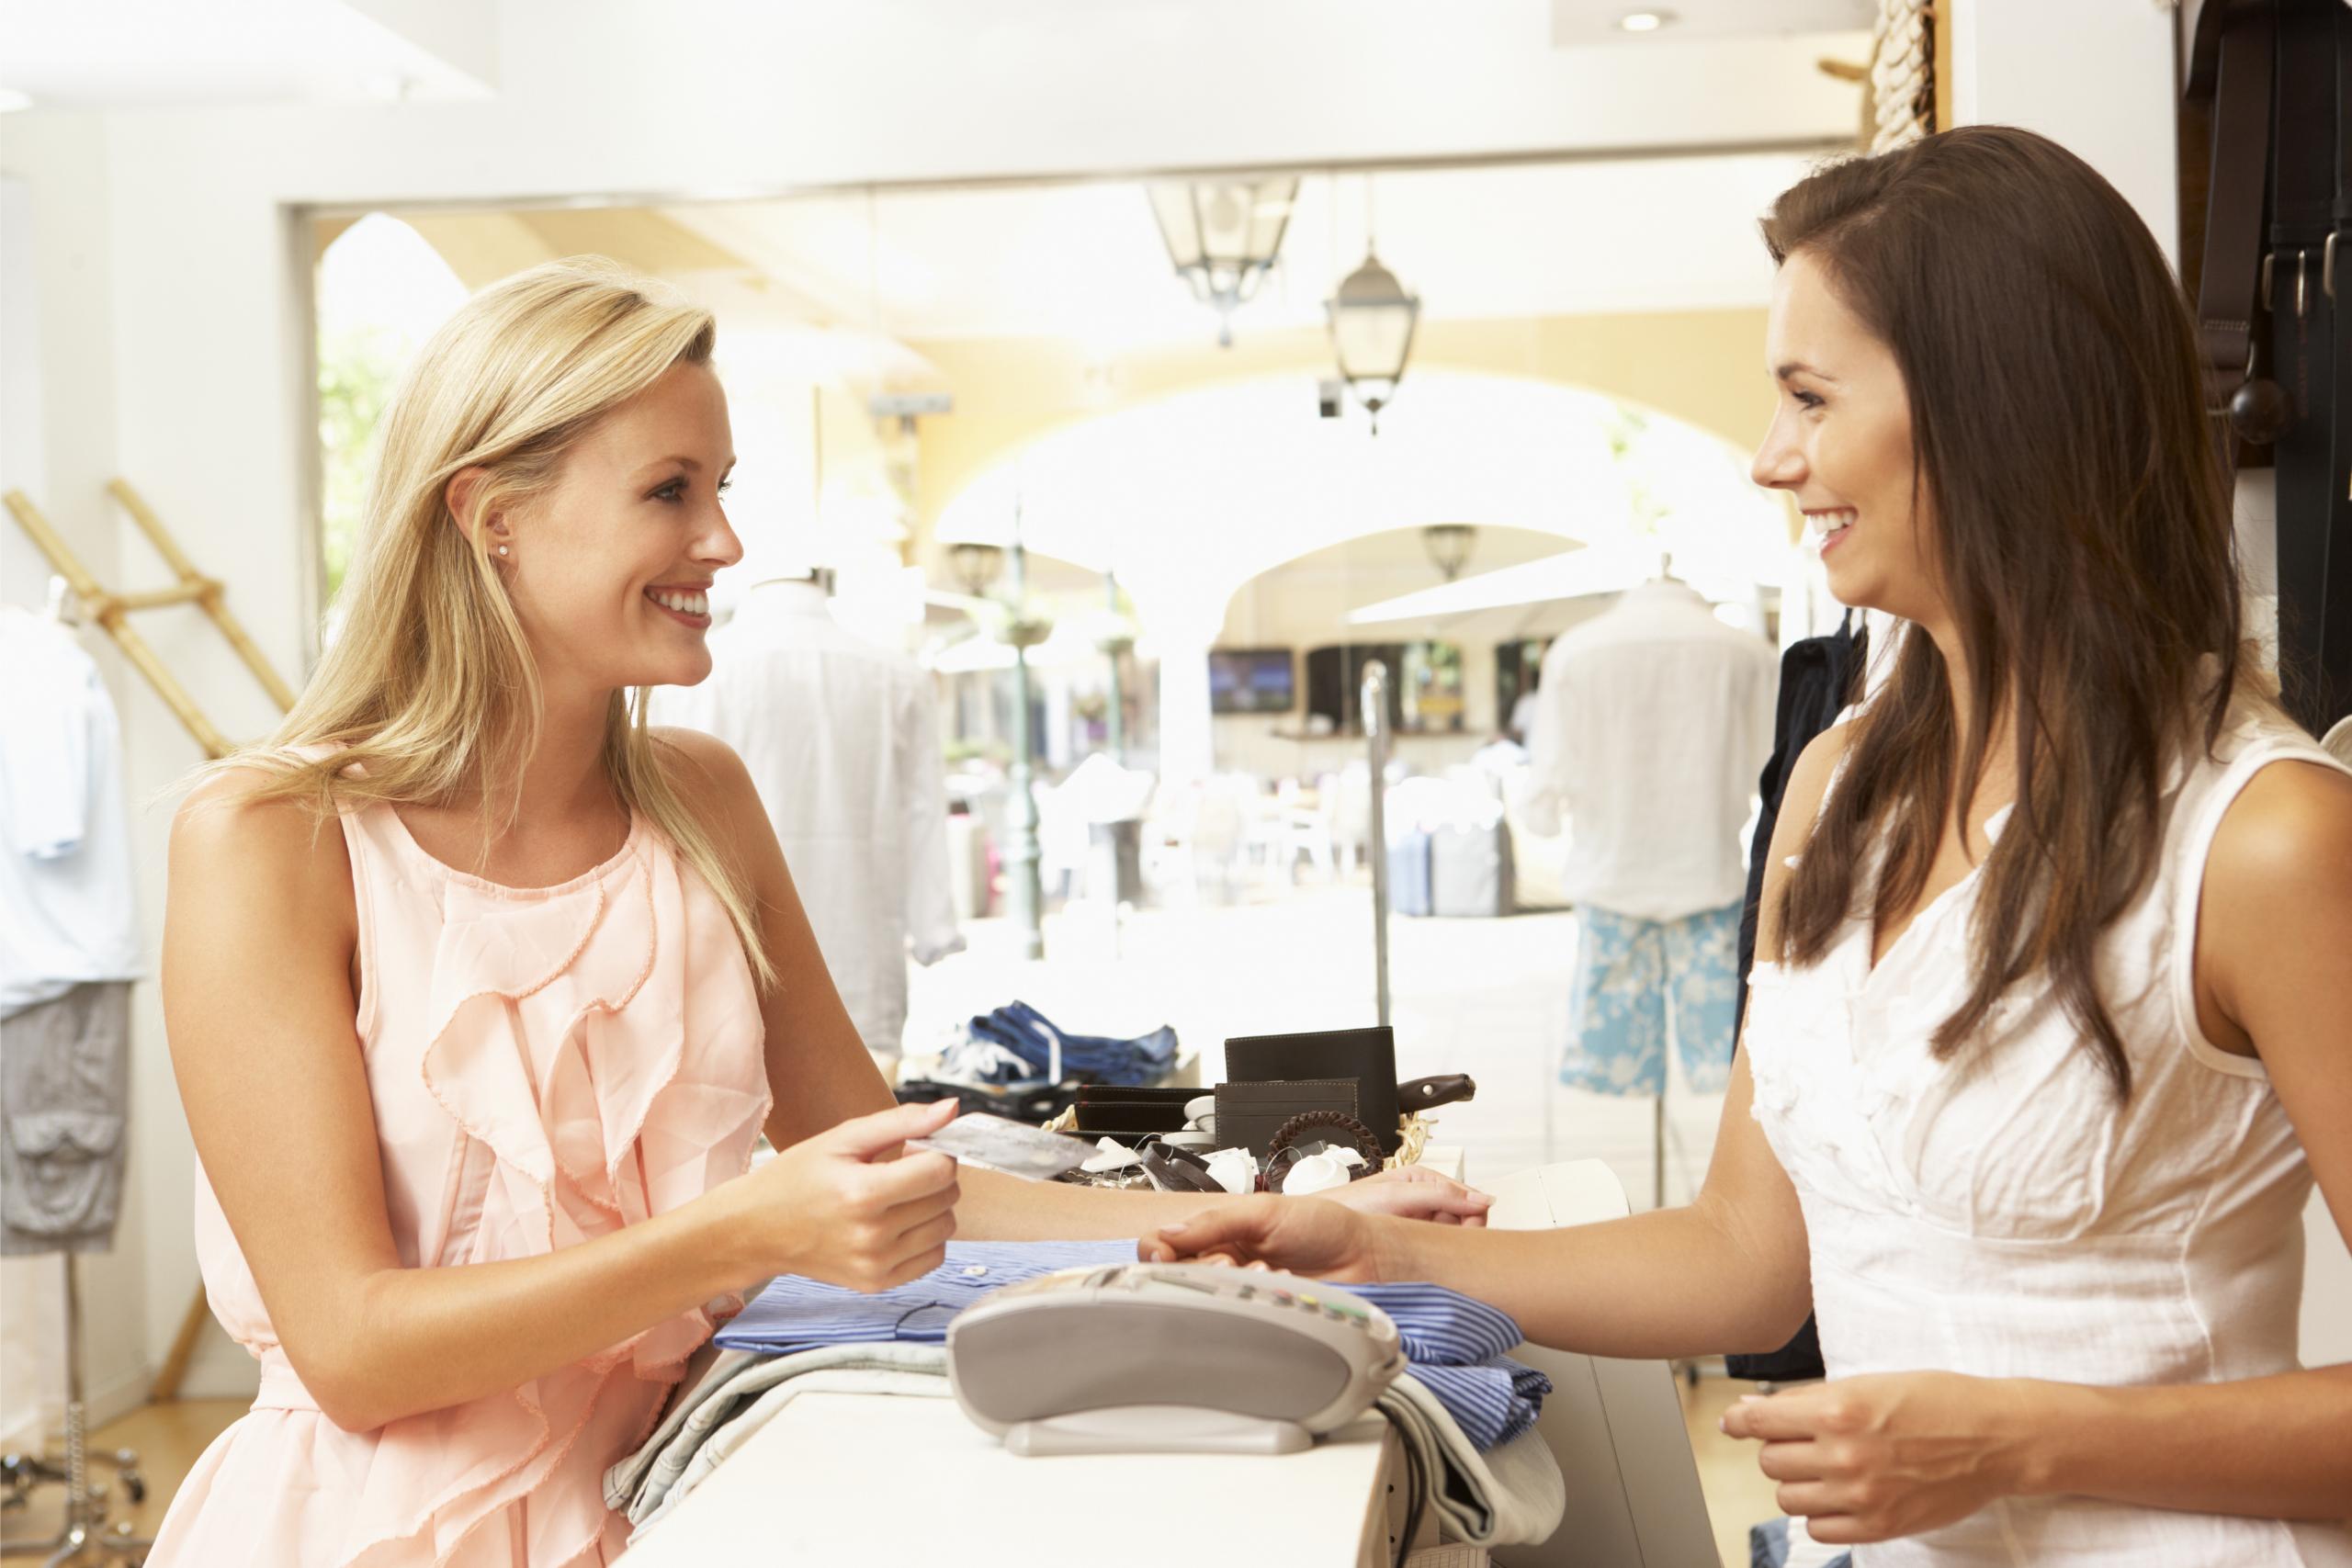 Mystery Shoppers look like regular customers